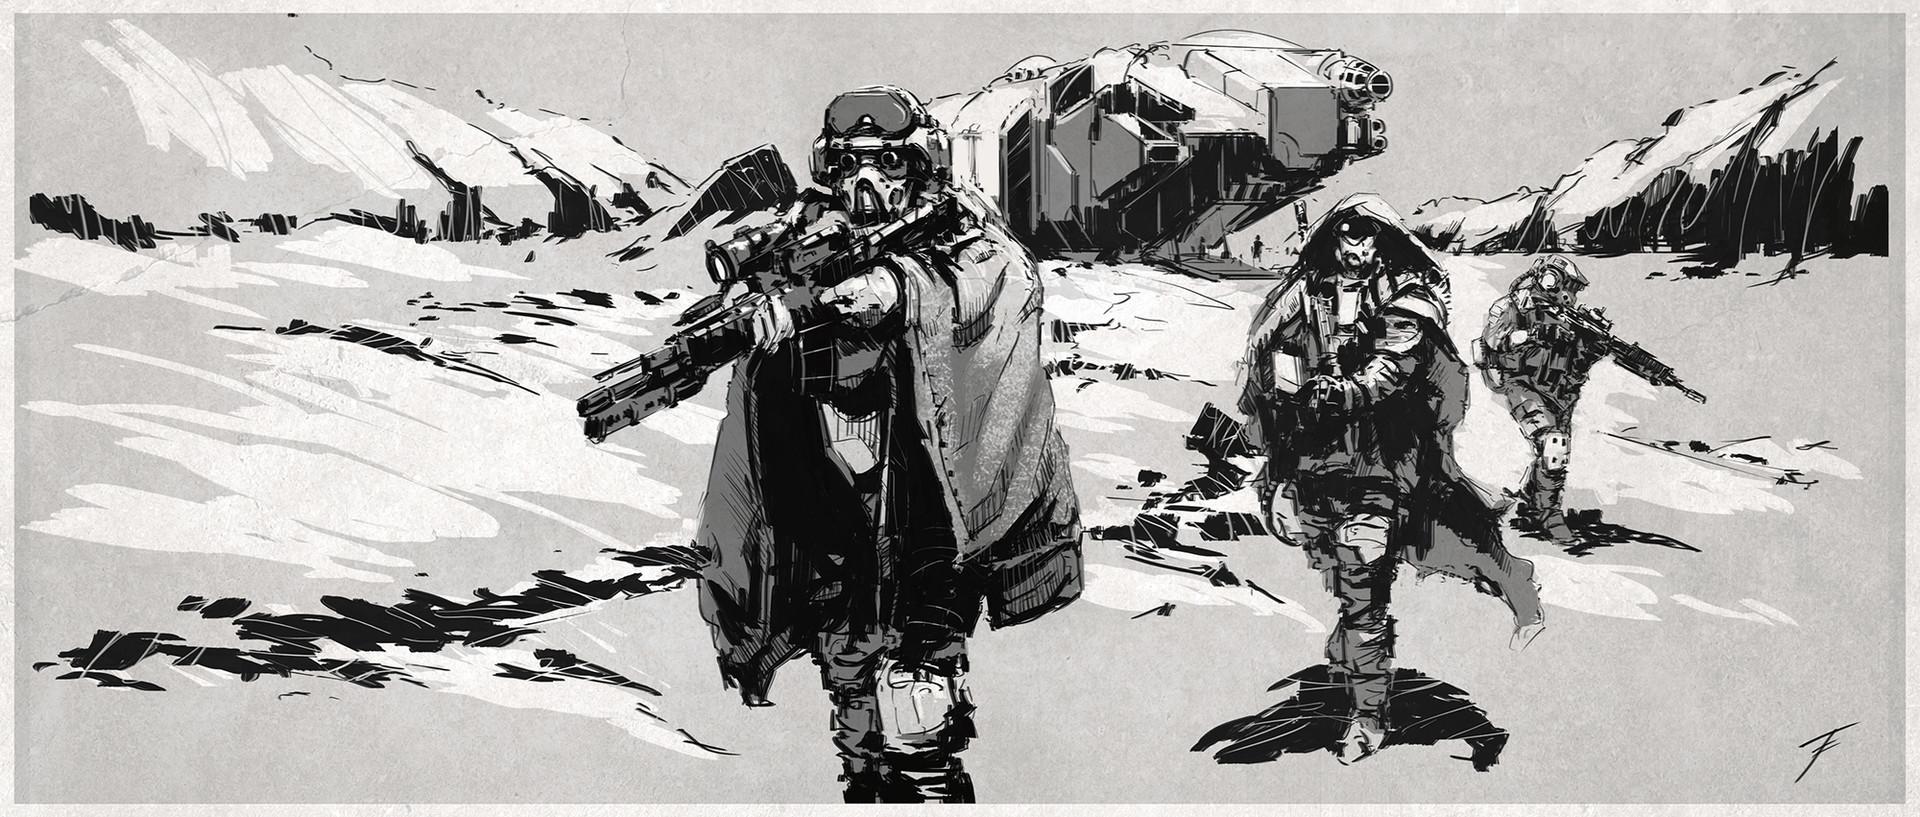 Joakim ericsson drawing 4